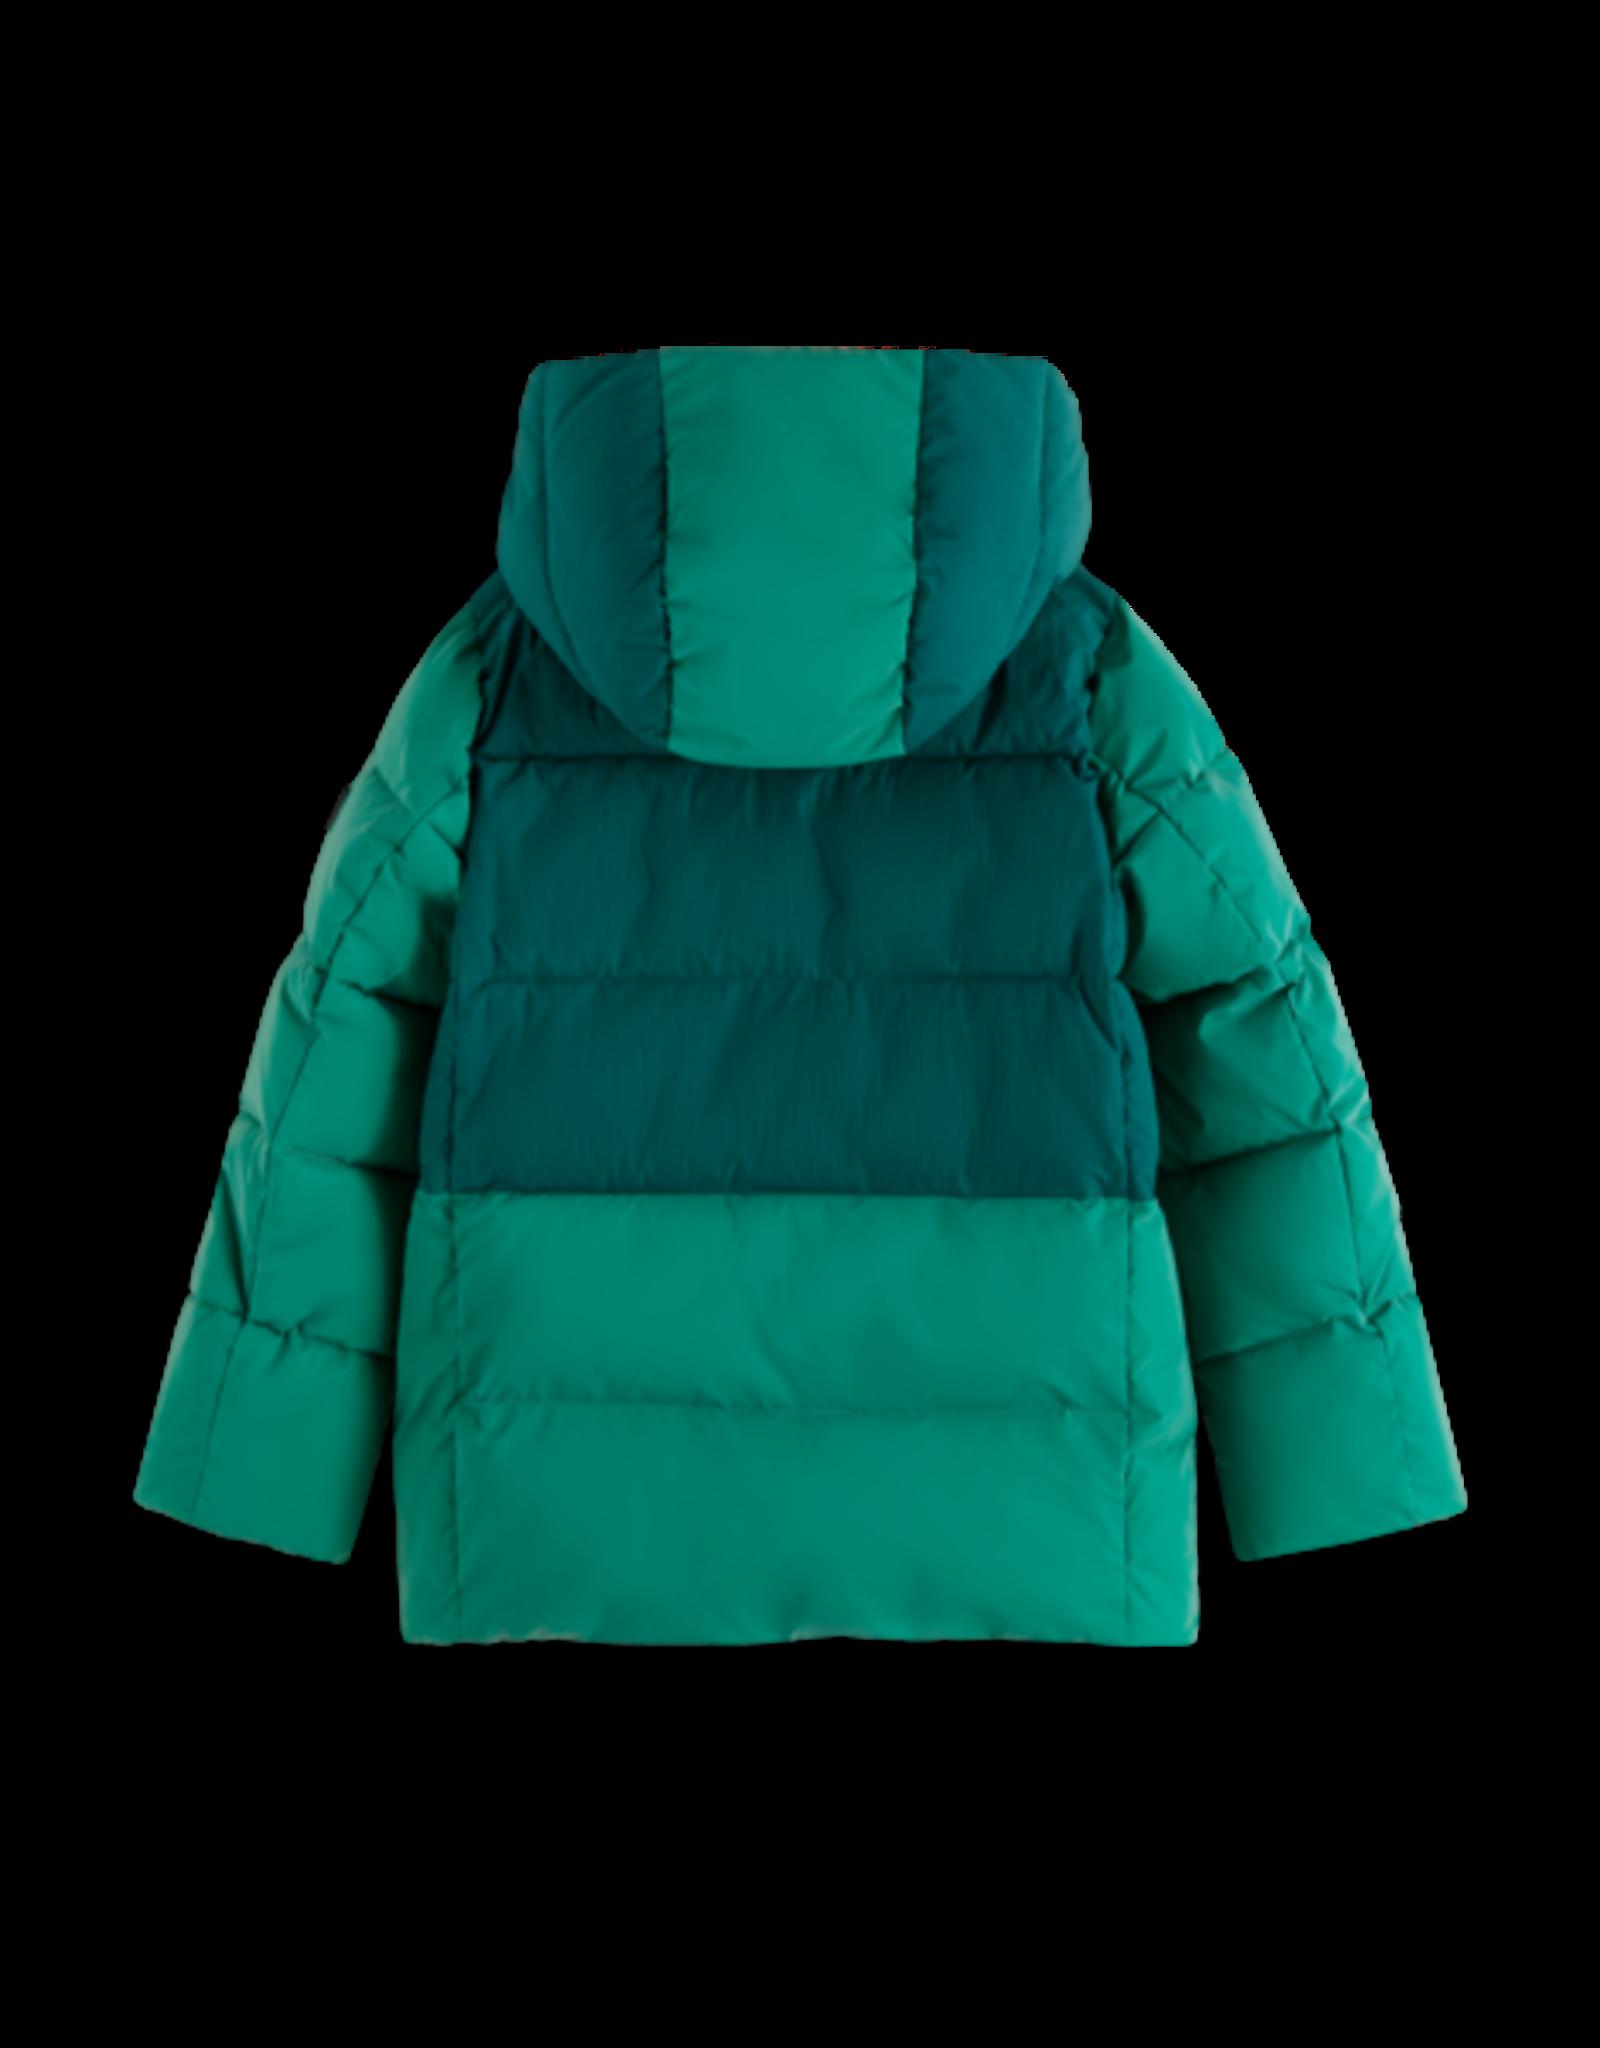 Scotch Shrunk Scotch Shrunk groene reflecterende jas met capuchon